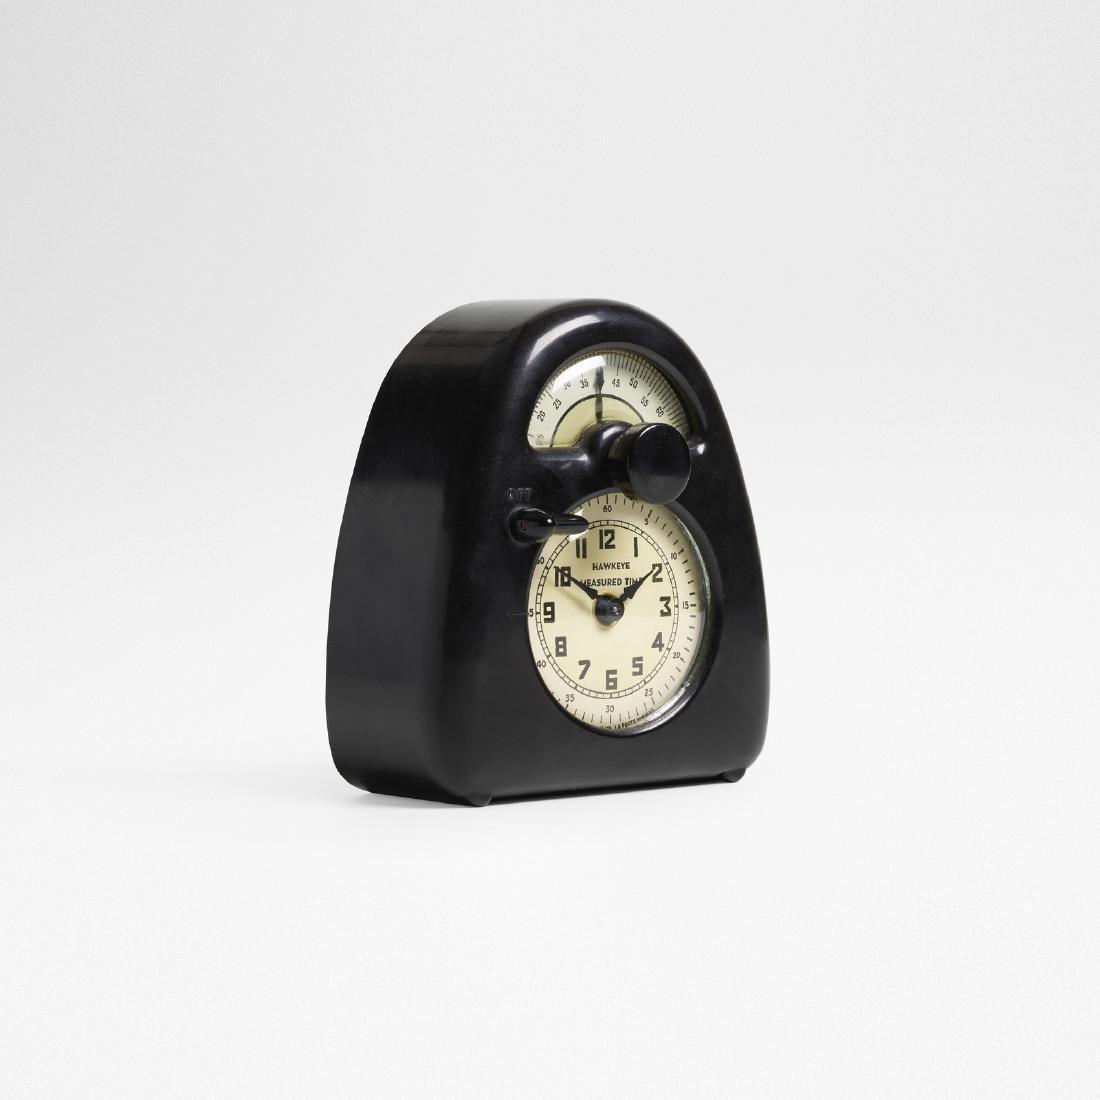 Isamu Noguchi, Measured Time clock and kitchen timer